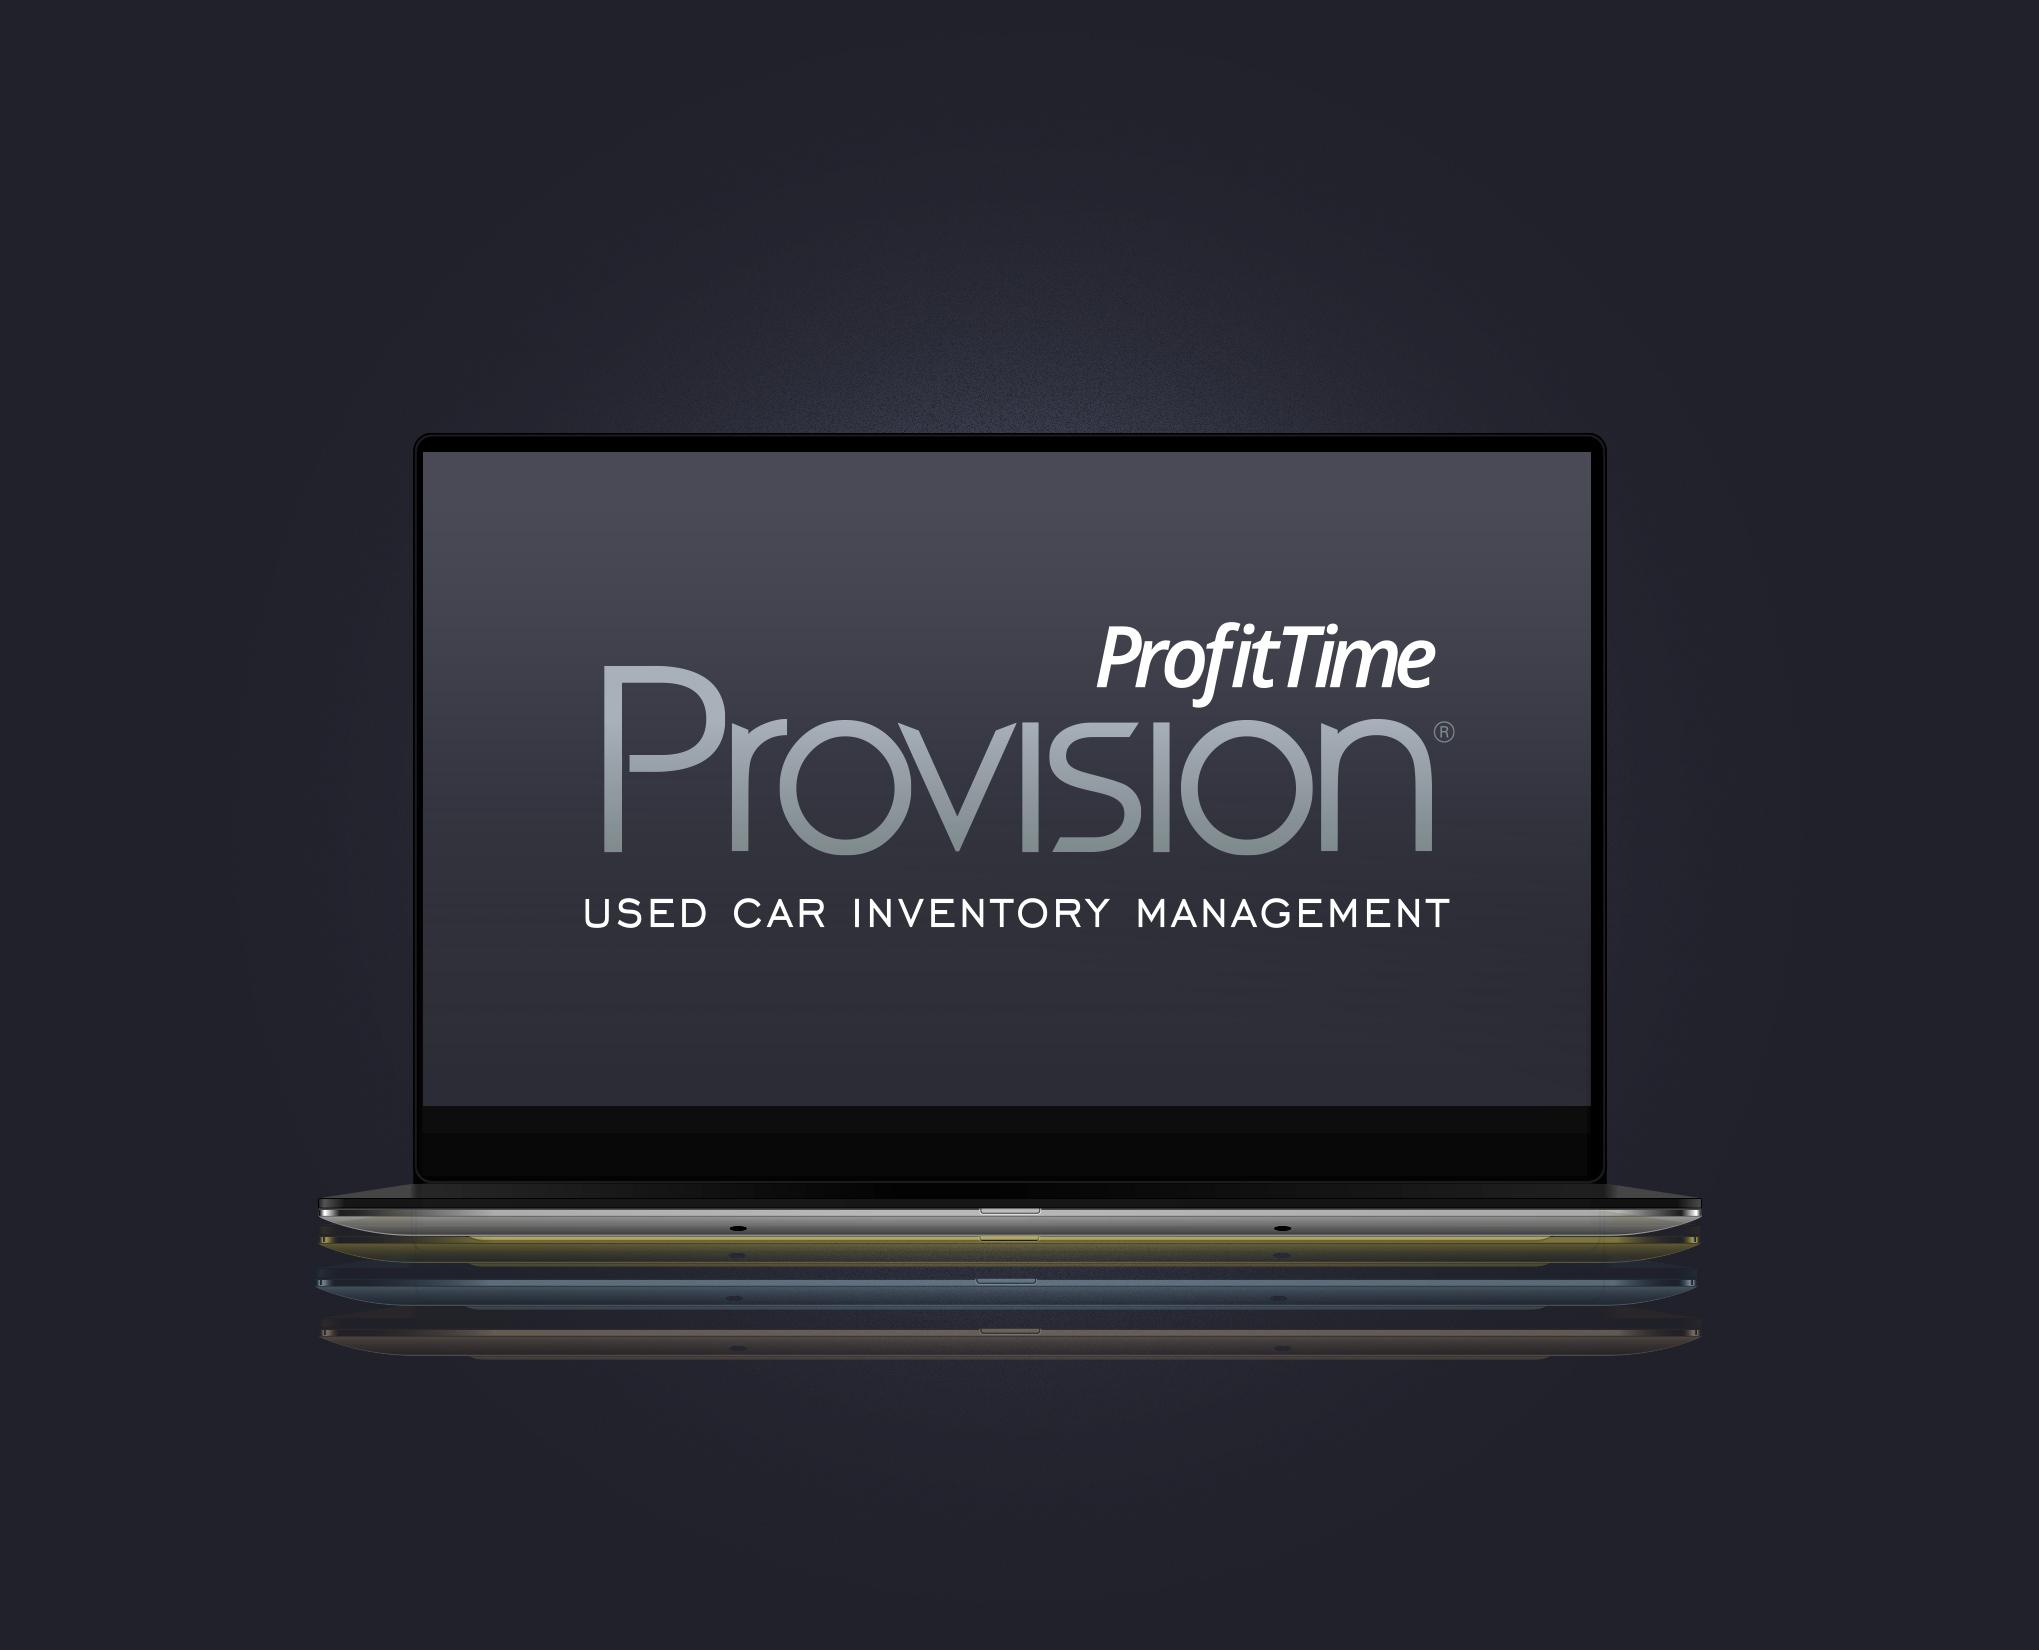 Provision ProfitTime Laptop